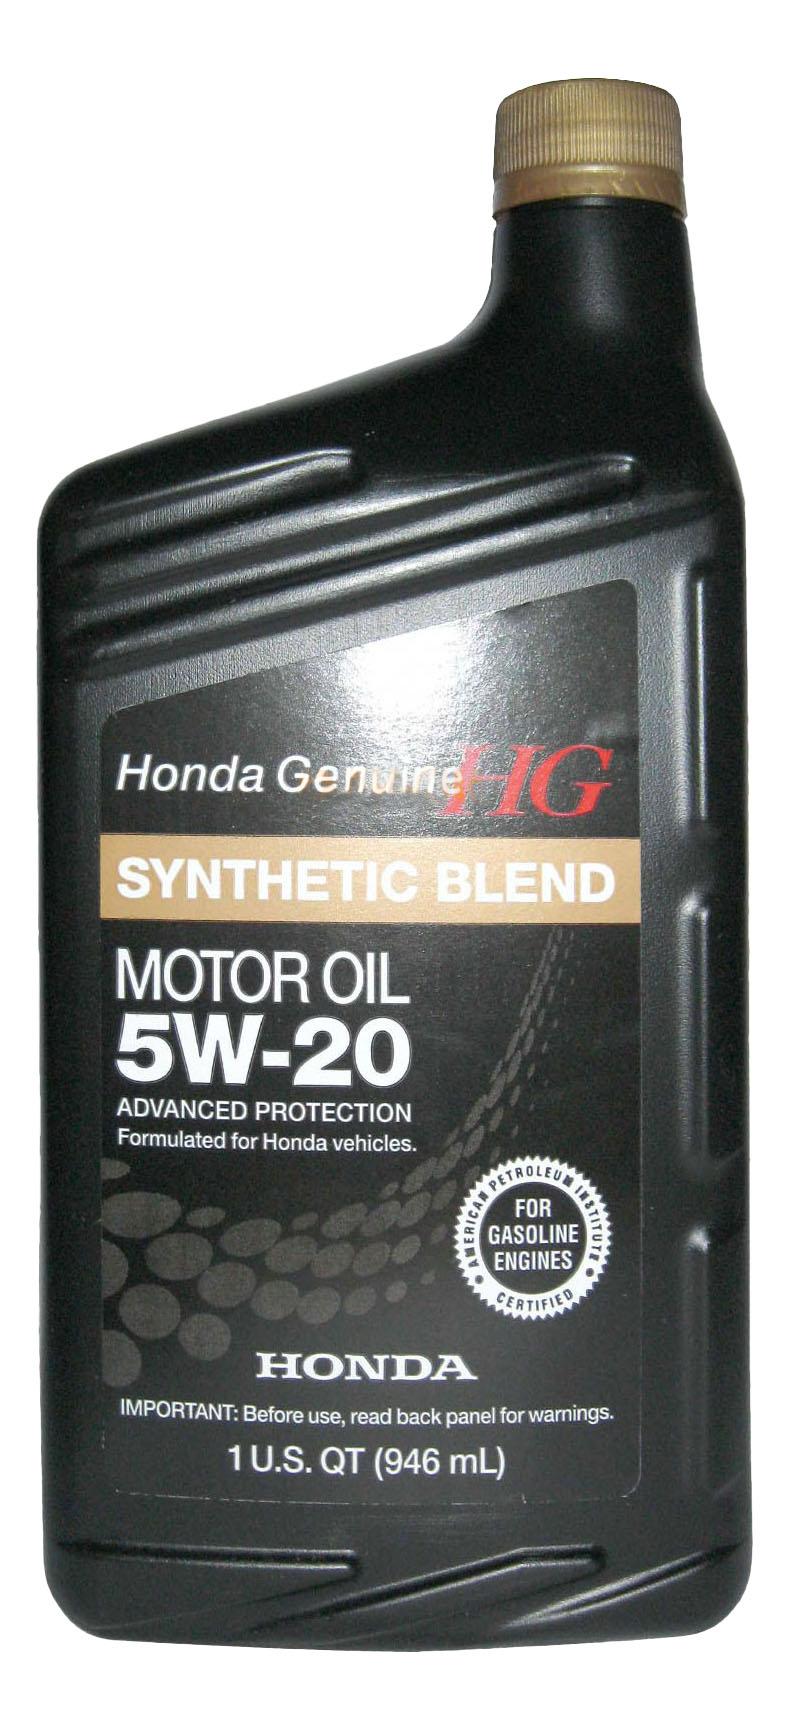 Моторное масло Honda Synthetic Blend 5W-20 0,946л